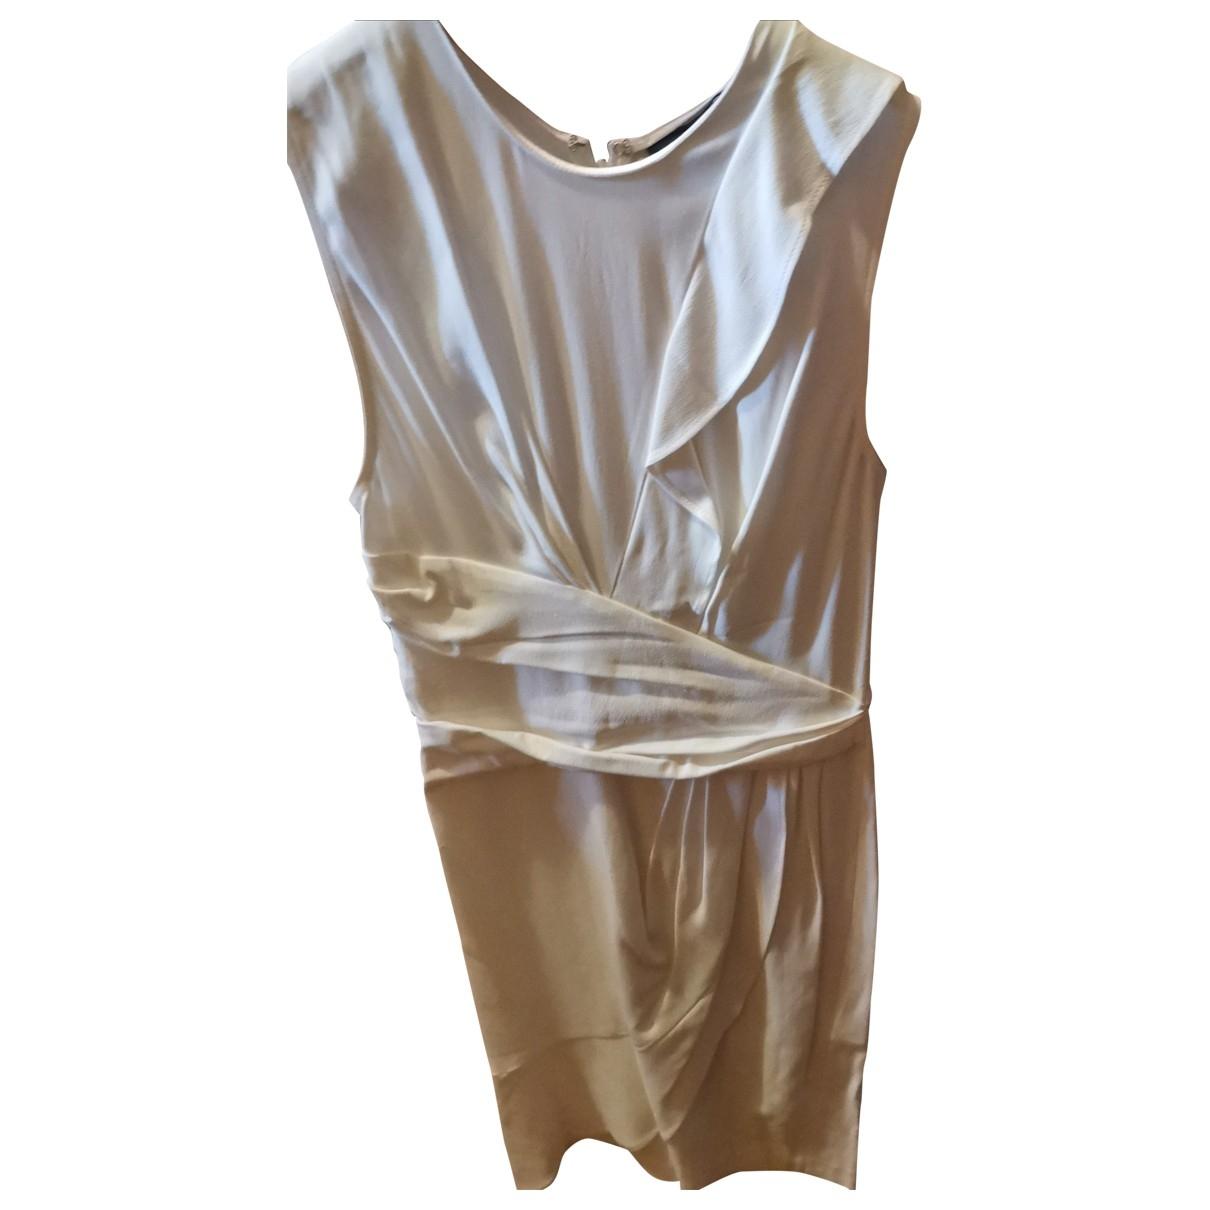 Elisabetta Franchi \N White Cotton - elasthane dress for Women 40 FR